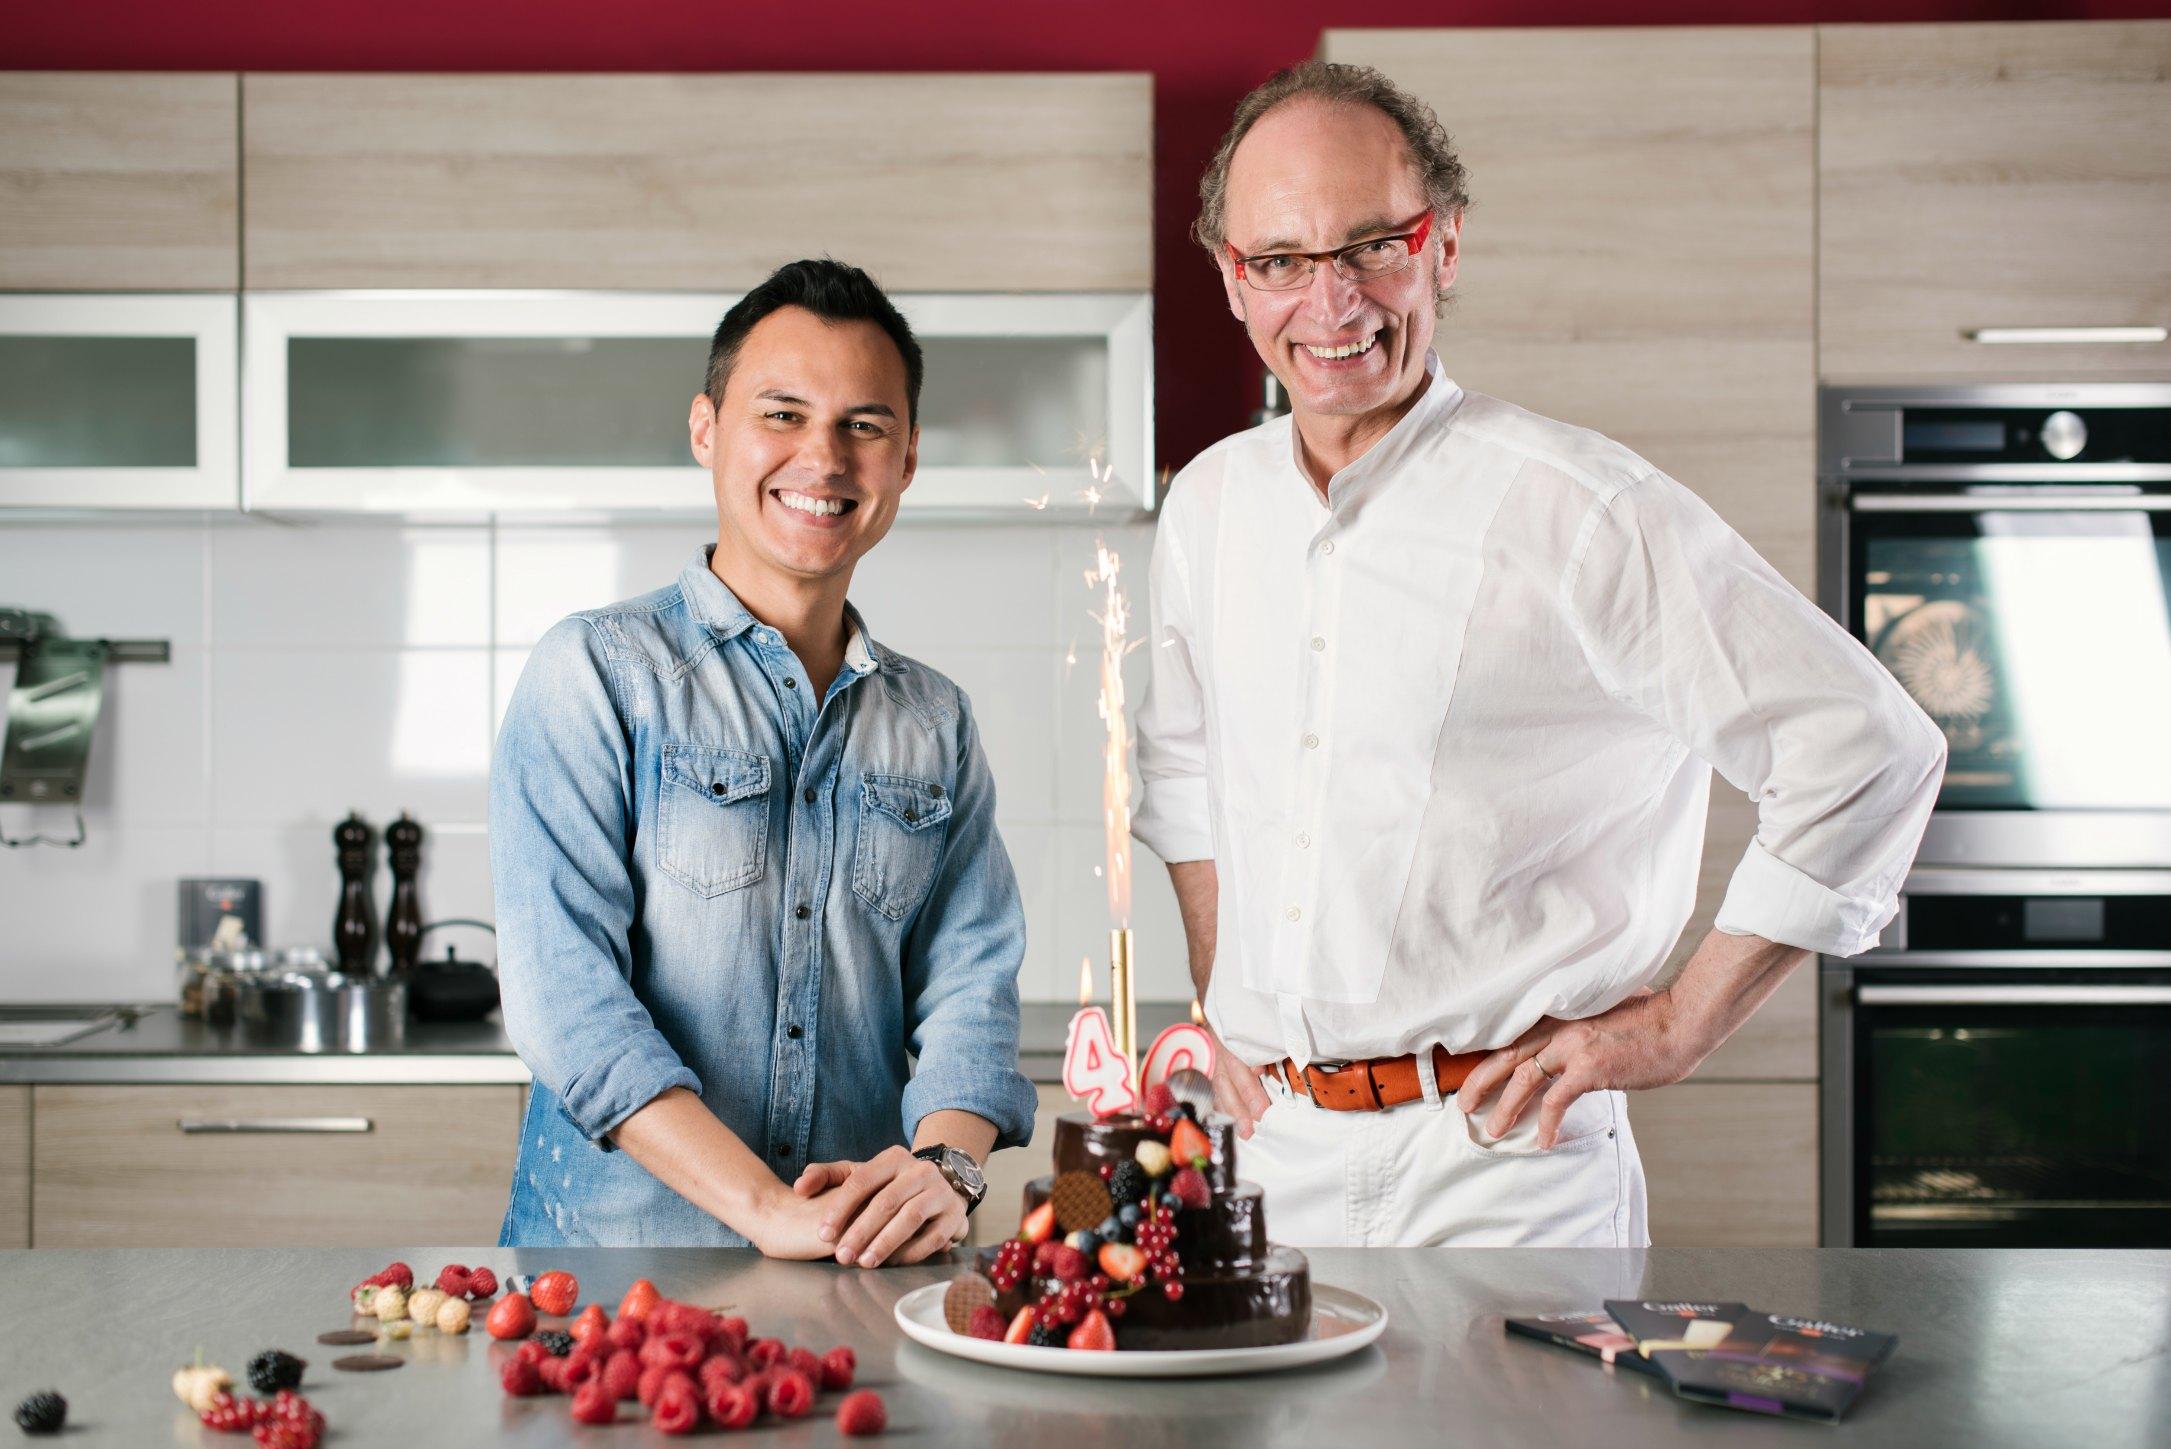 Jean galler et herv cuisine proposent une recette au chocolat gastronomica - Herve cuisine cake chocolat ...